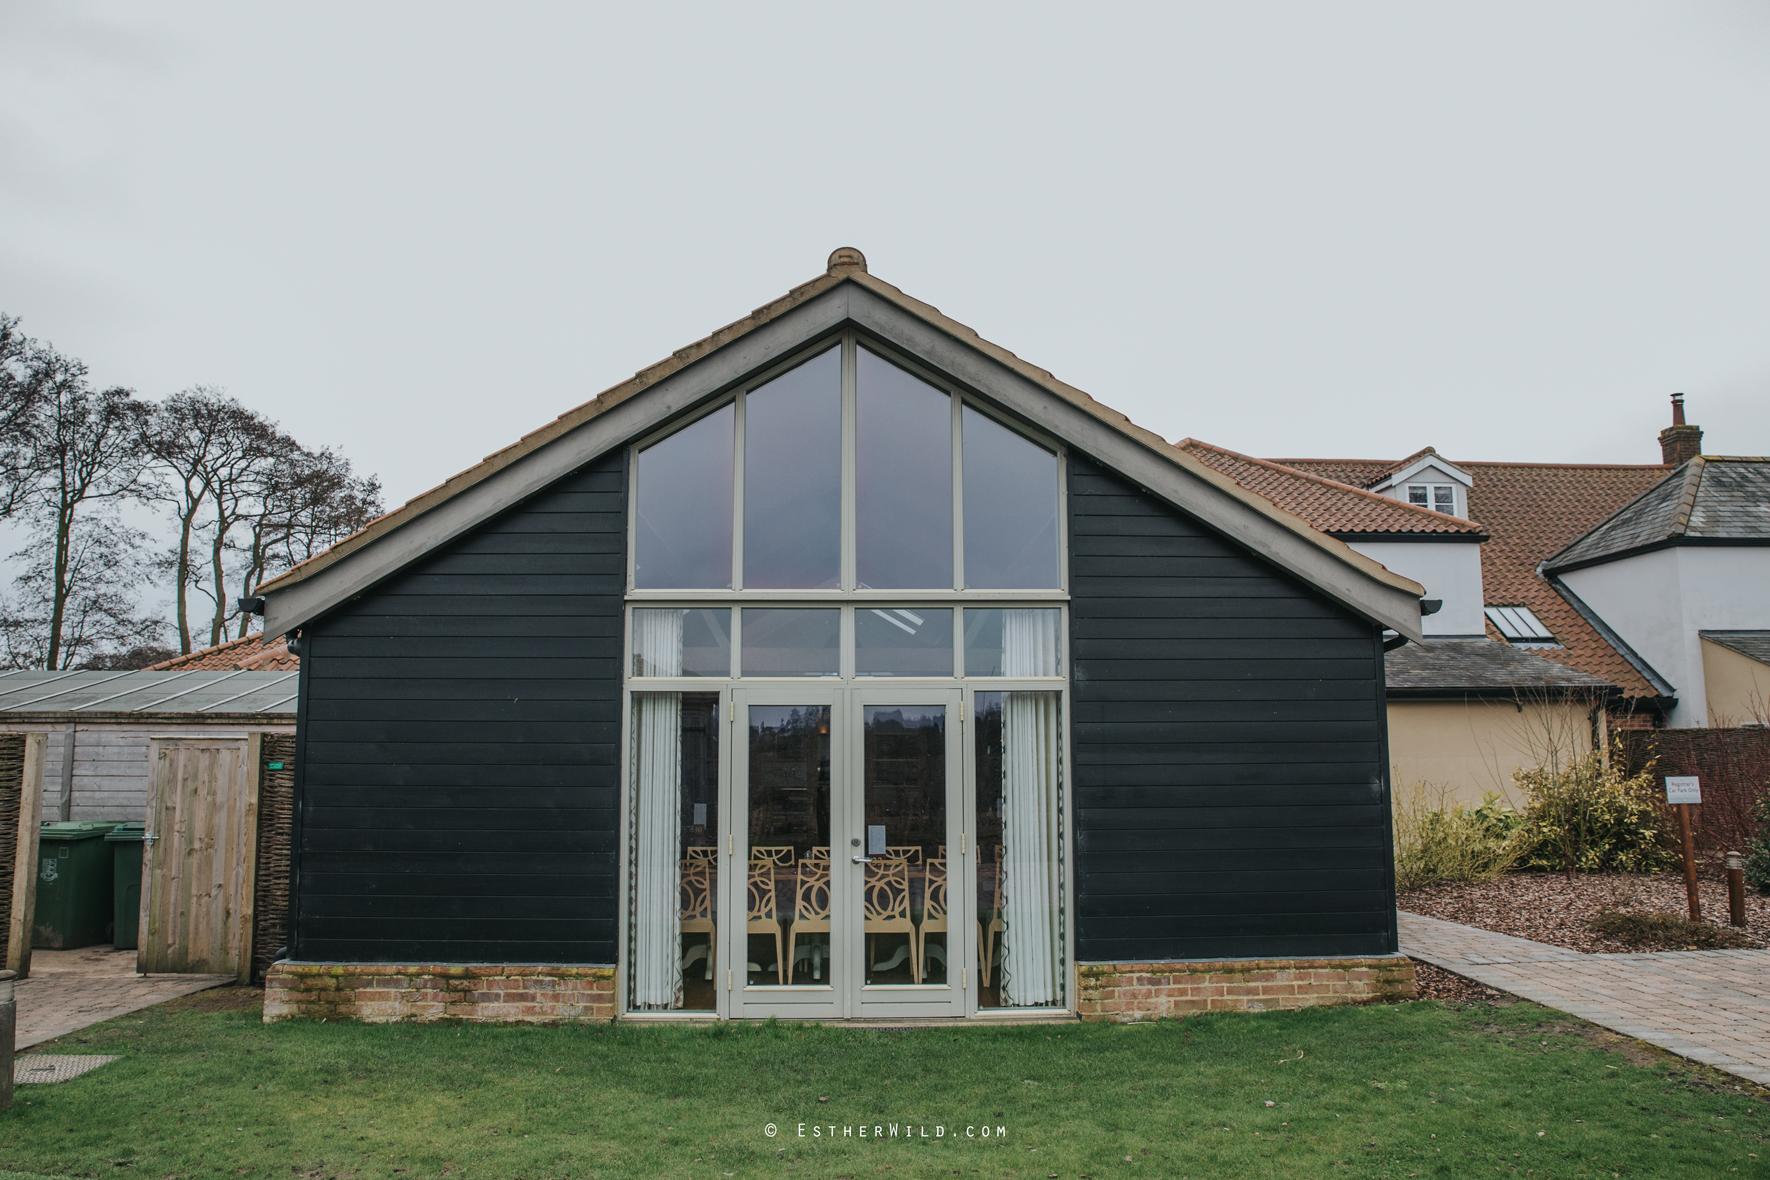 The_BoatHouse_Wedding_Venue_Ormesby_Norfolk_Broads_Boat_Wedding_Photography_Esther_Wild_Photographer_IMG_0101.jpg